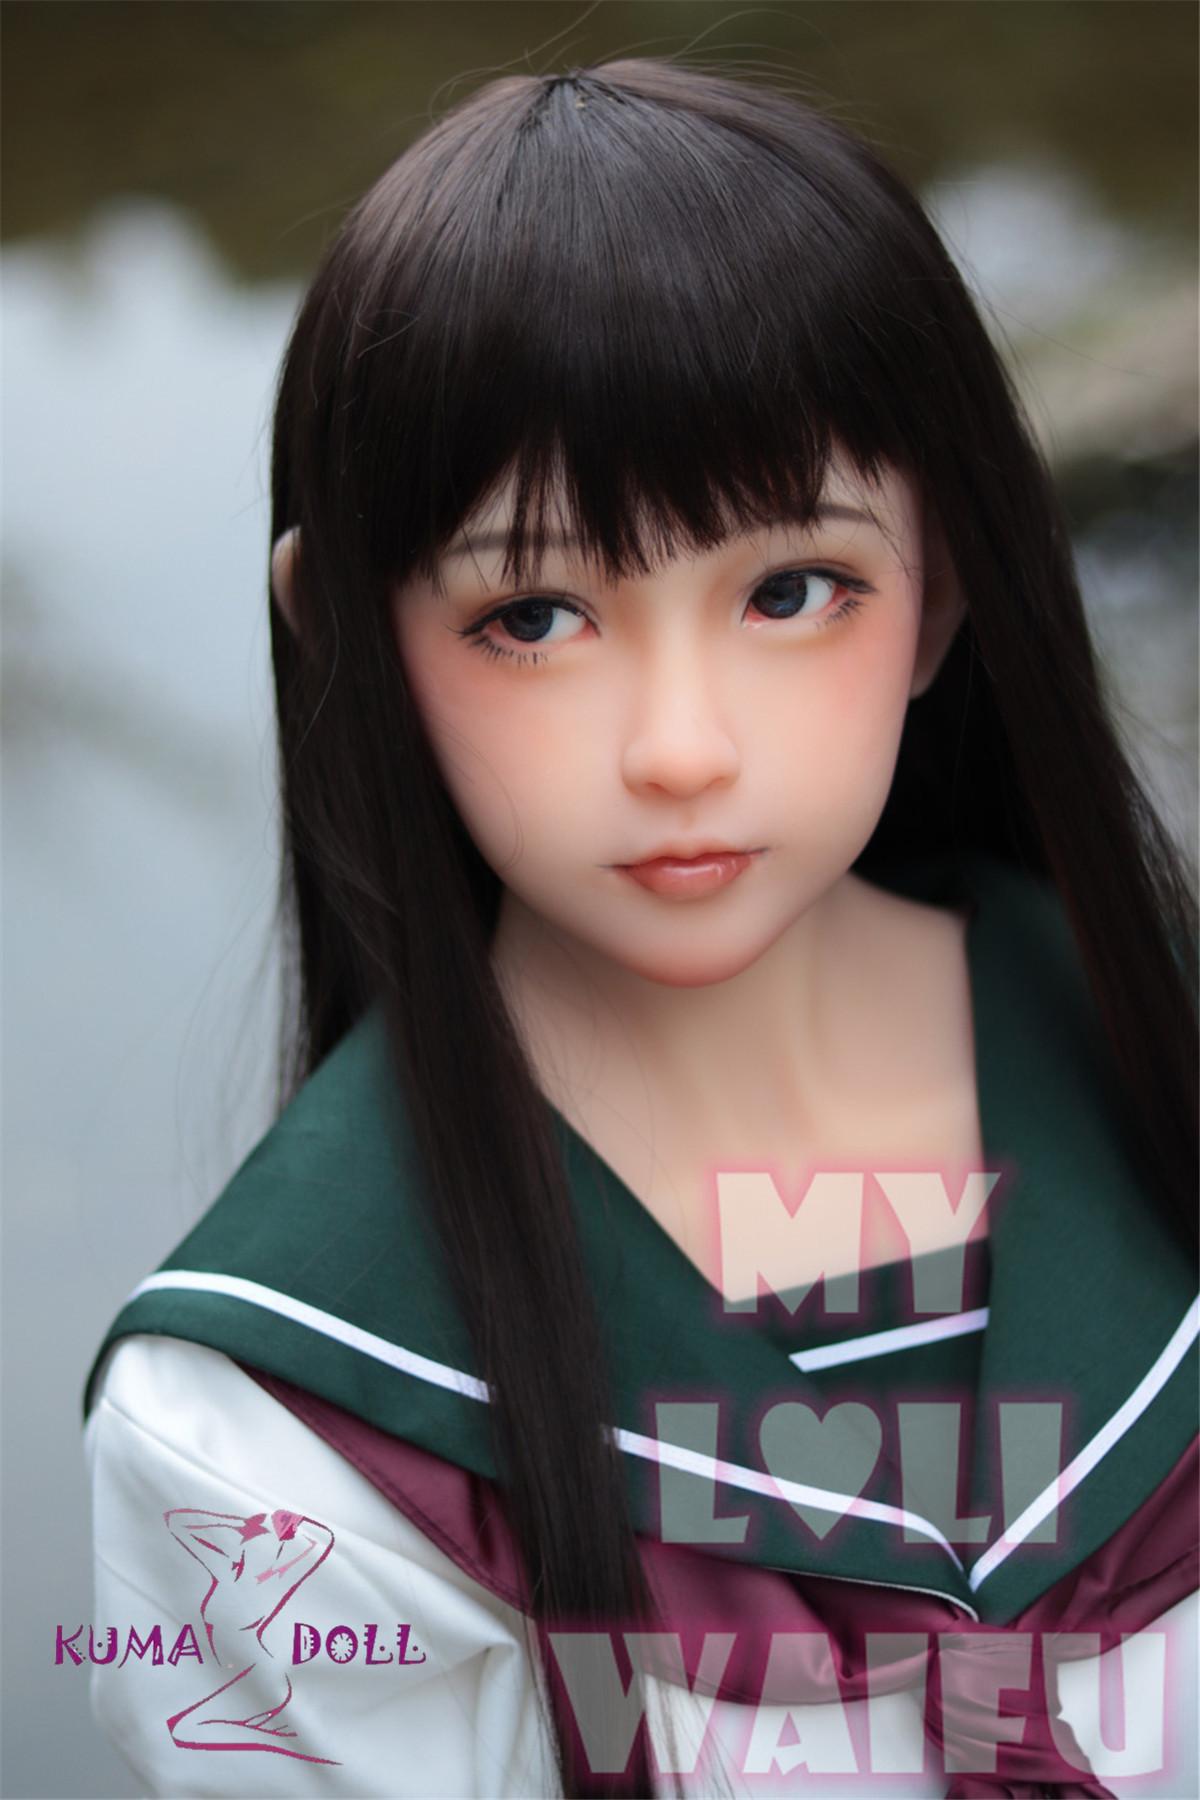 My Loli Waifu 略称MLWロり系ラブドール 138cmAカップ 陽葵Haruki頭部 TPE材質ボディー ヘッド材質選択可能 メイク選択可能